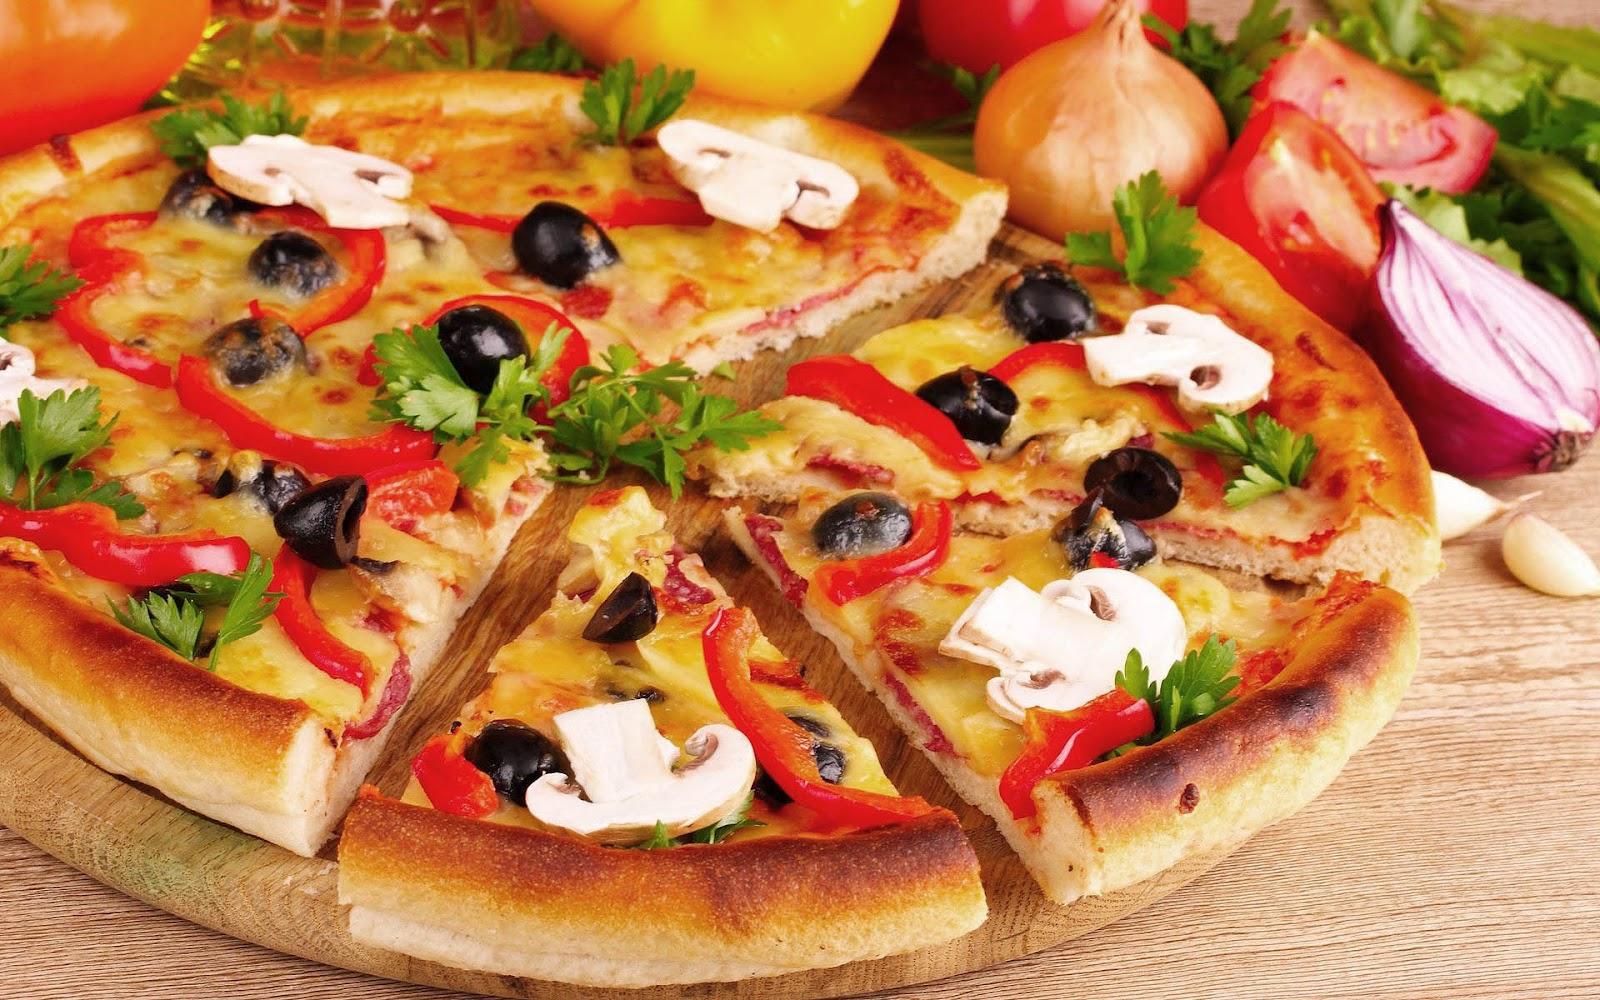 http://2.bp.blogspot.com/-TmJjuCfsTaM/UEXLBWpYw9I/AAAAAAAAGBo/Y5L-q0sK9tA/s1600/hd-pizza-wallpaper-lekkere-stukken-pizza-hd-eten-achtergrond-foto.jpg